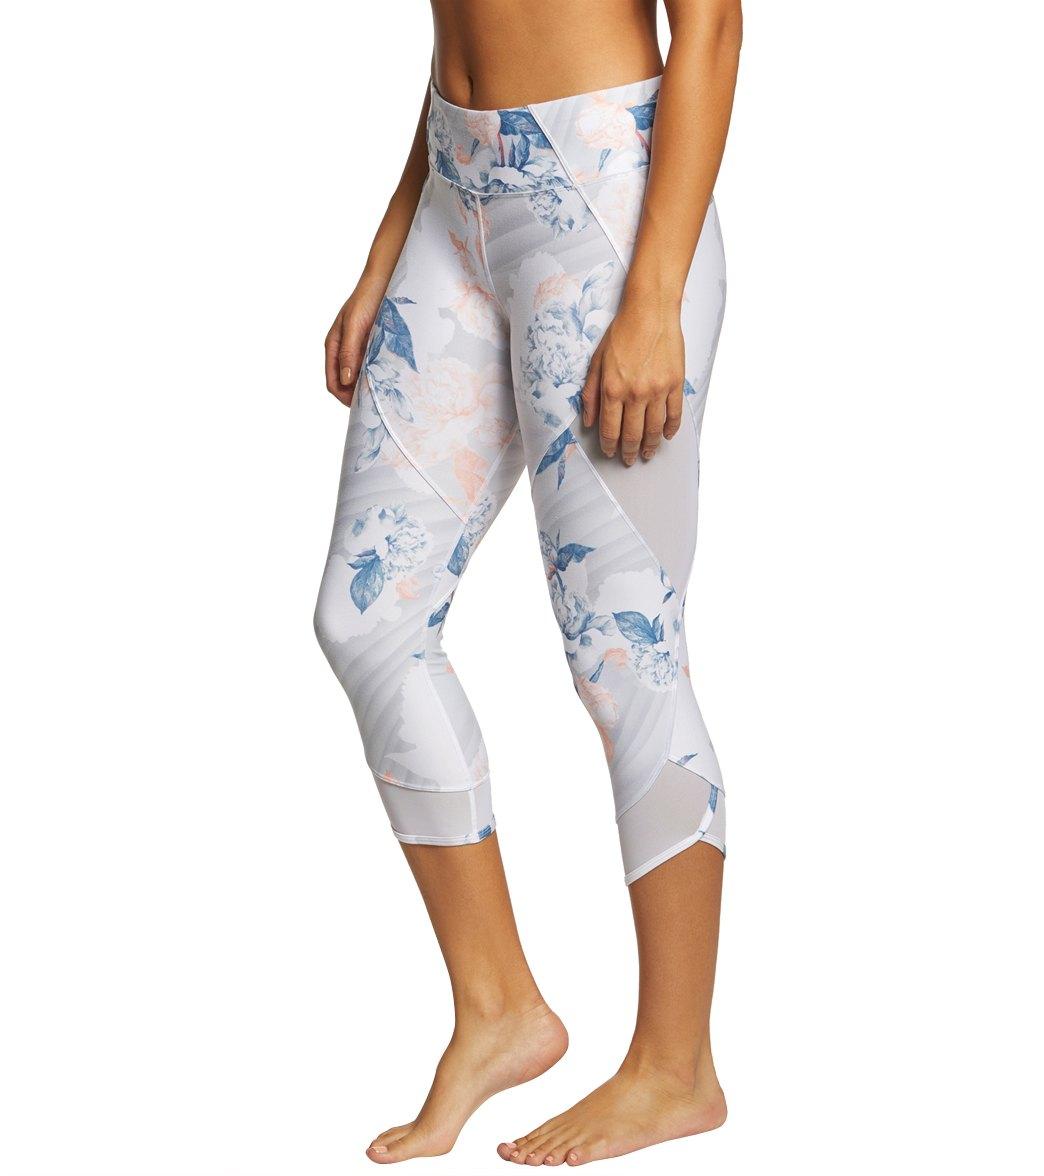 3eccf695123da Betsey Johnson Performance Mesh Insert Printed Yoga Capris at ...